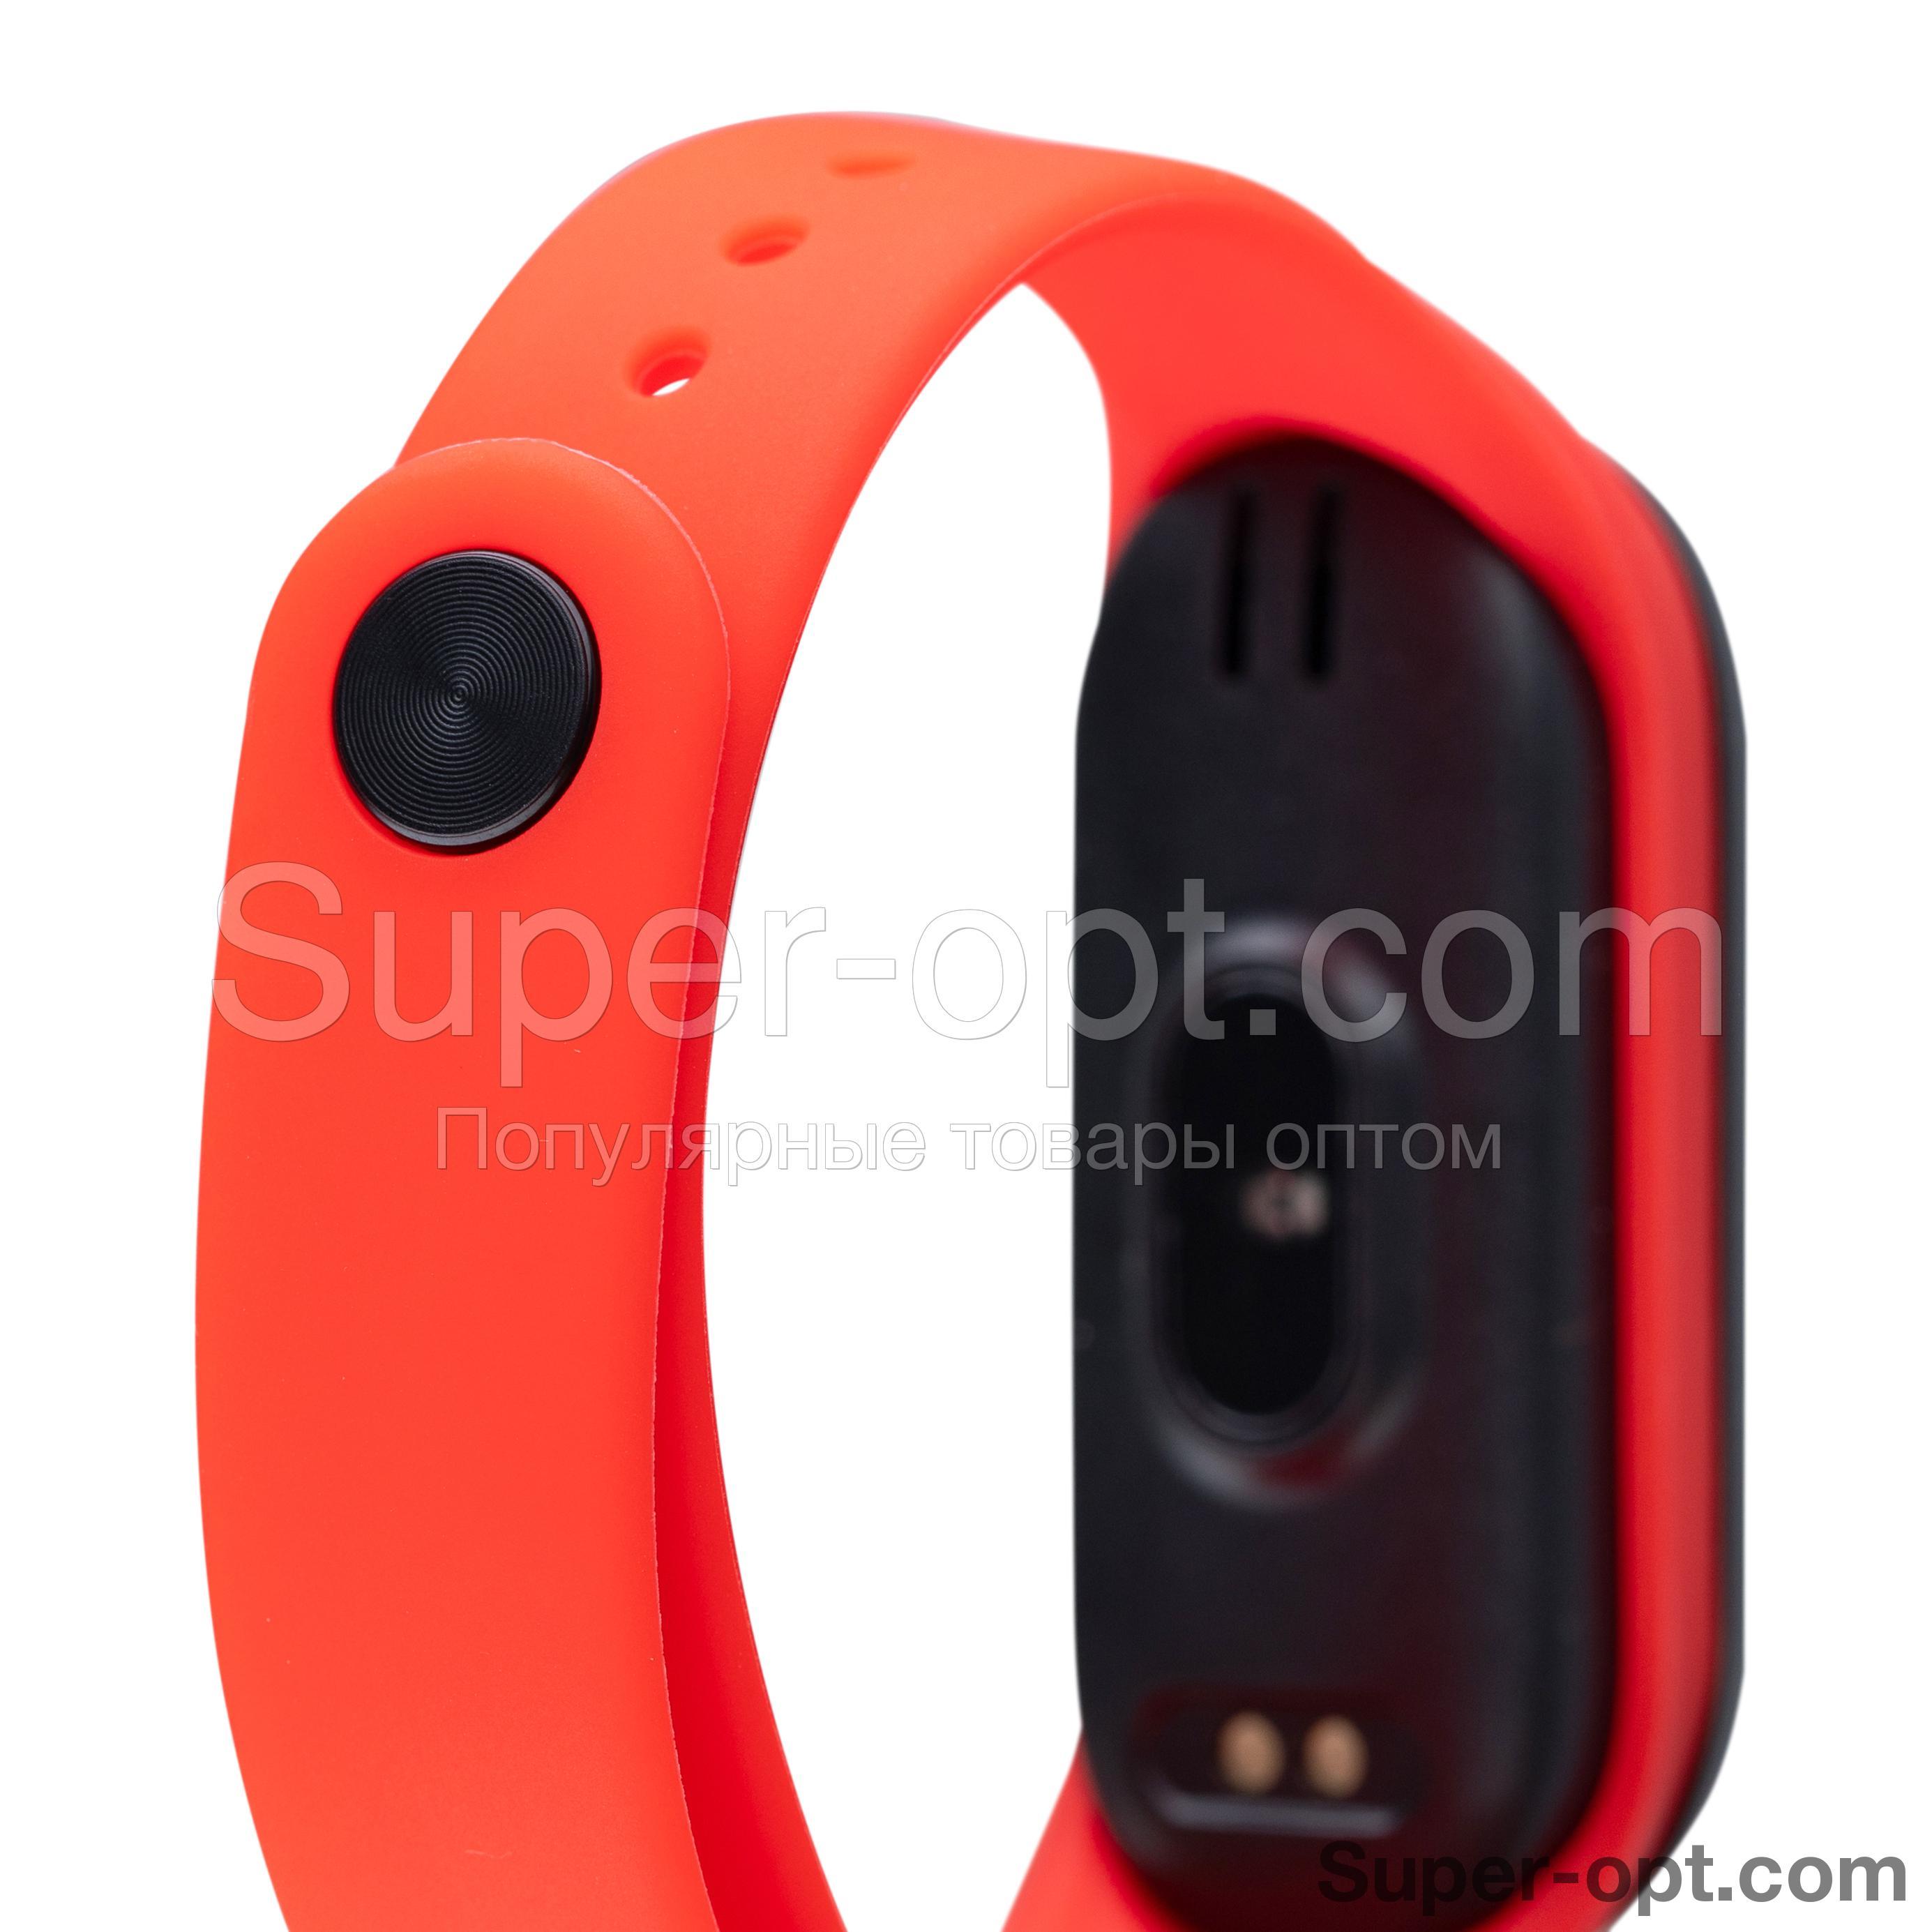 Фитнес-браслет Smart Bracelet Band M5 оптом